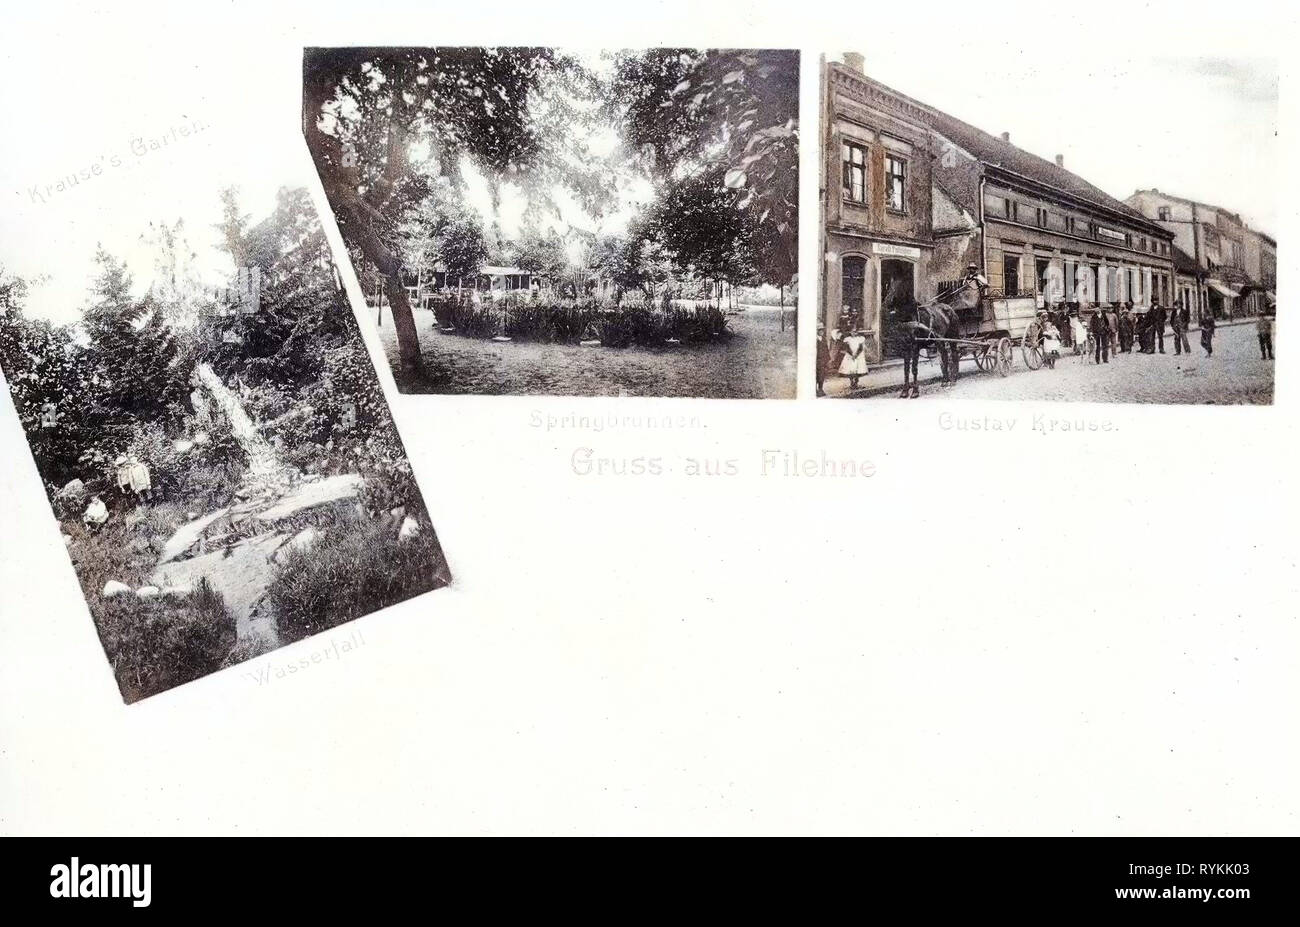 Multiview postcards, History of Wieleń, 1903, Greater Poland Voivodeship, Filehne, Gustav Krause, Unternehmen, Springbrunnen - Stock Image